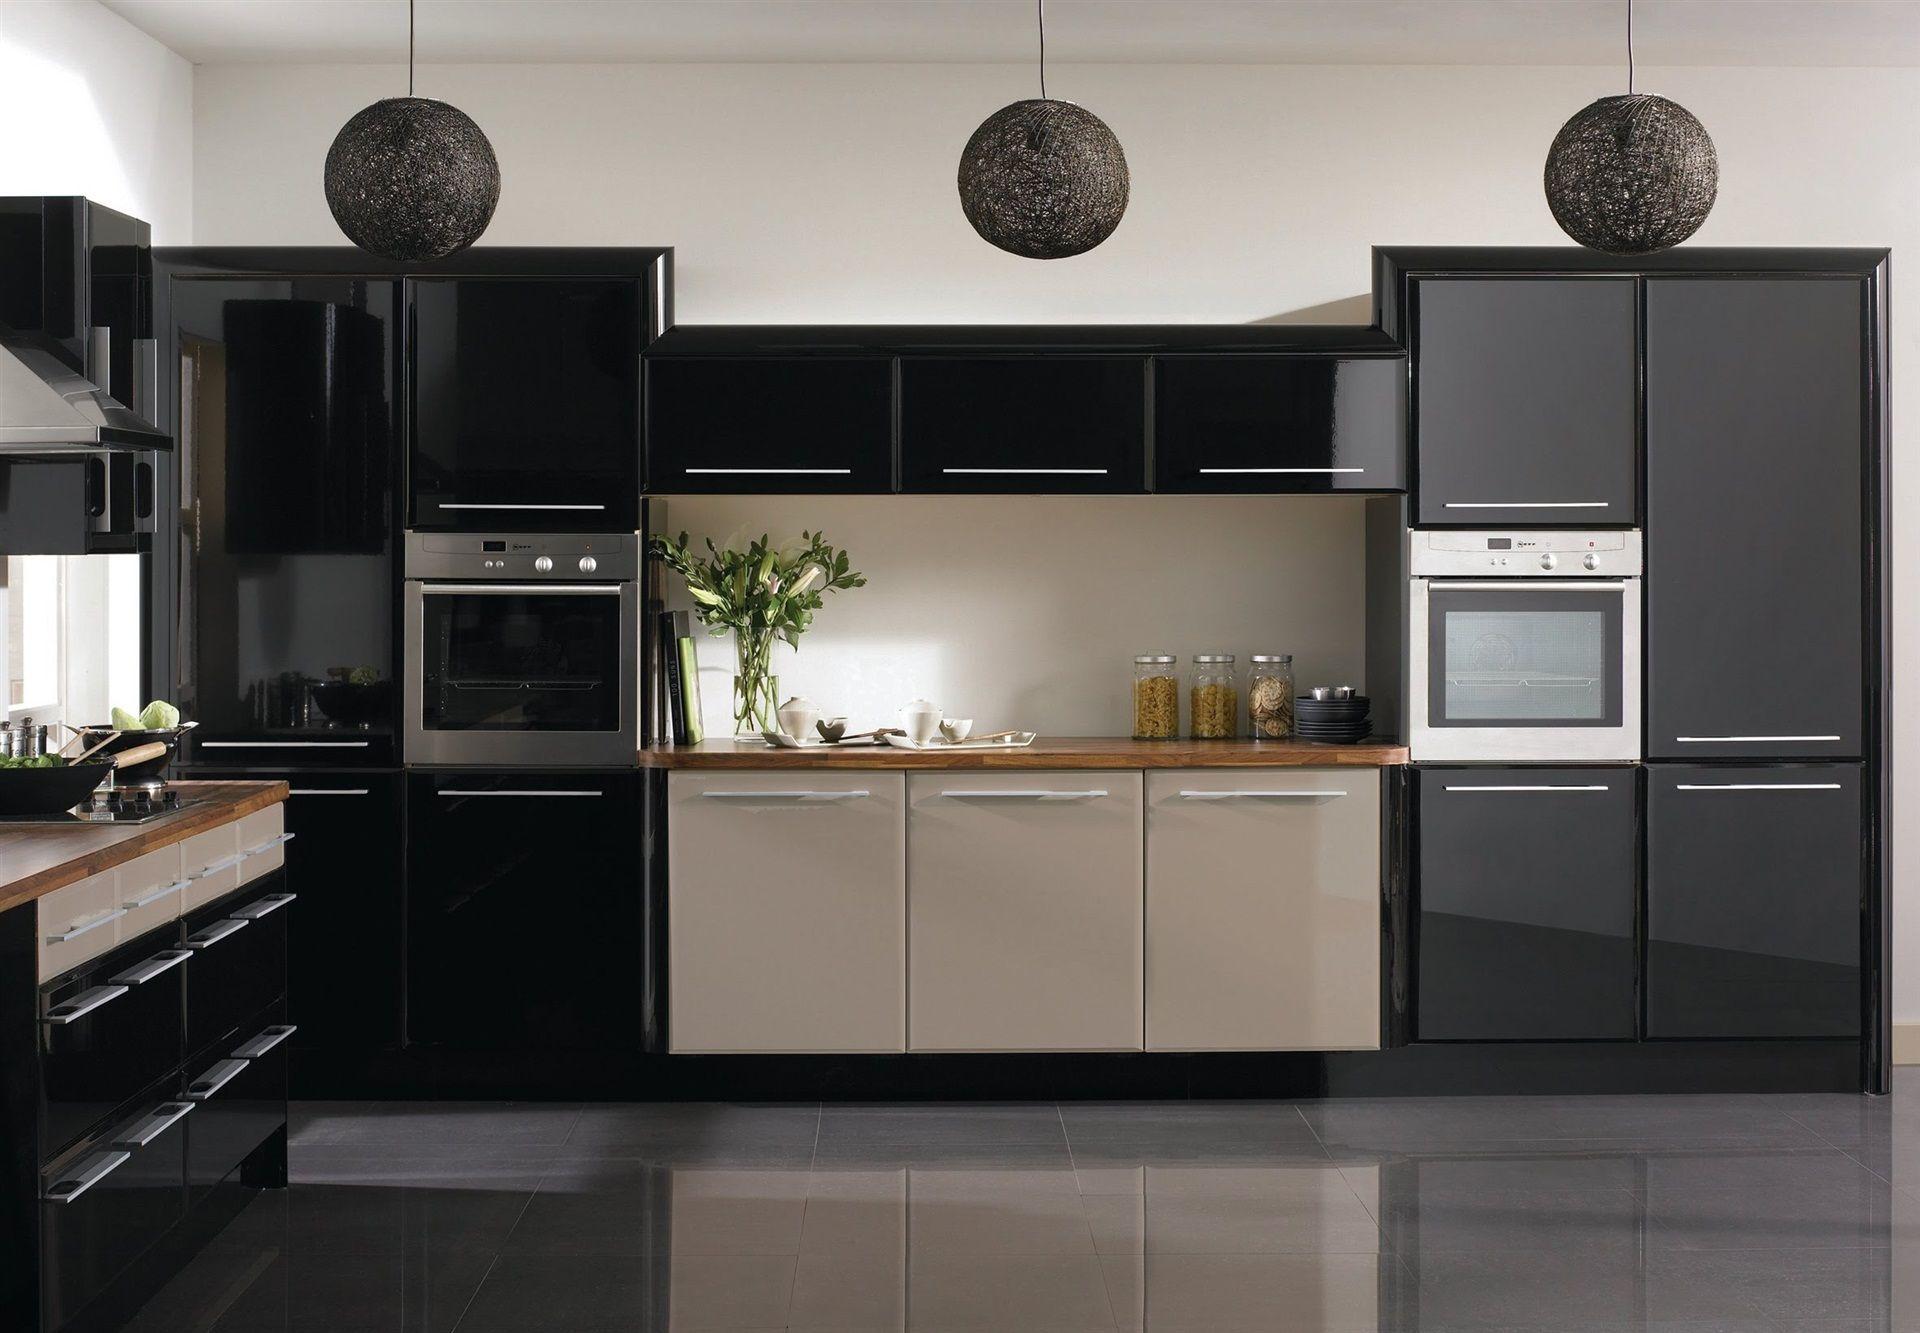 Beige Cappuccino Flat Kitchen Interior Design Style House Room Black Kitchen Cabinets Modern Kitchen Design Black Kitchens